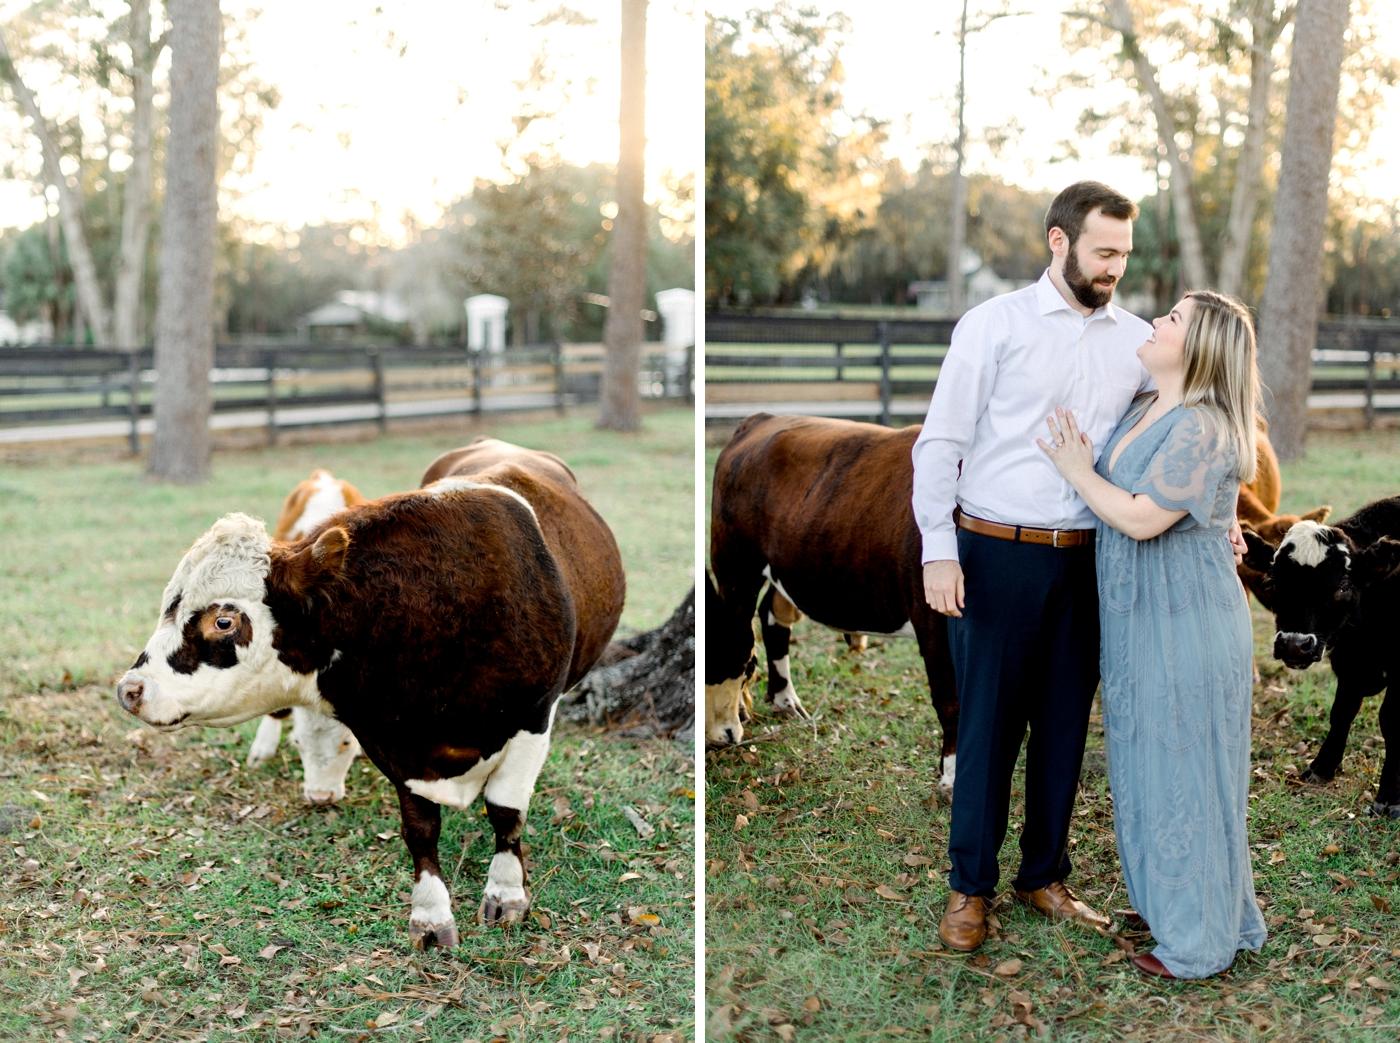 mini cows photo shoot